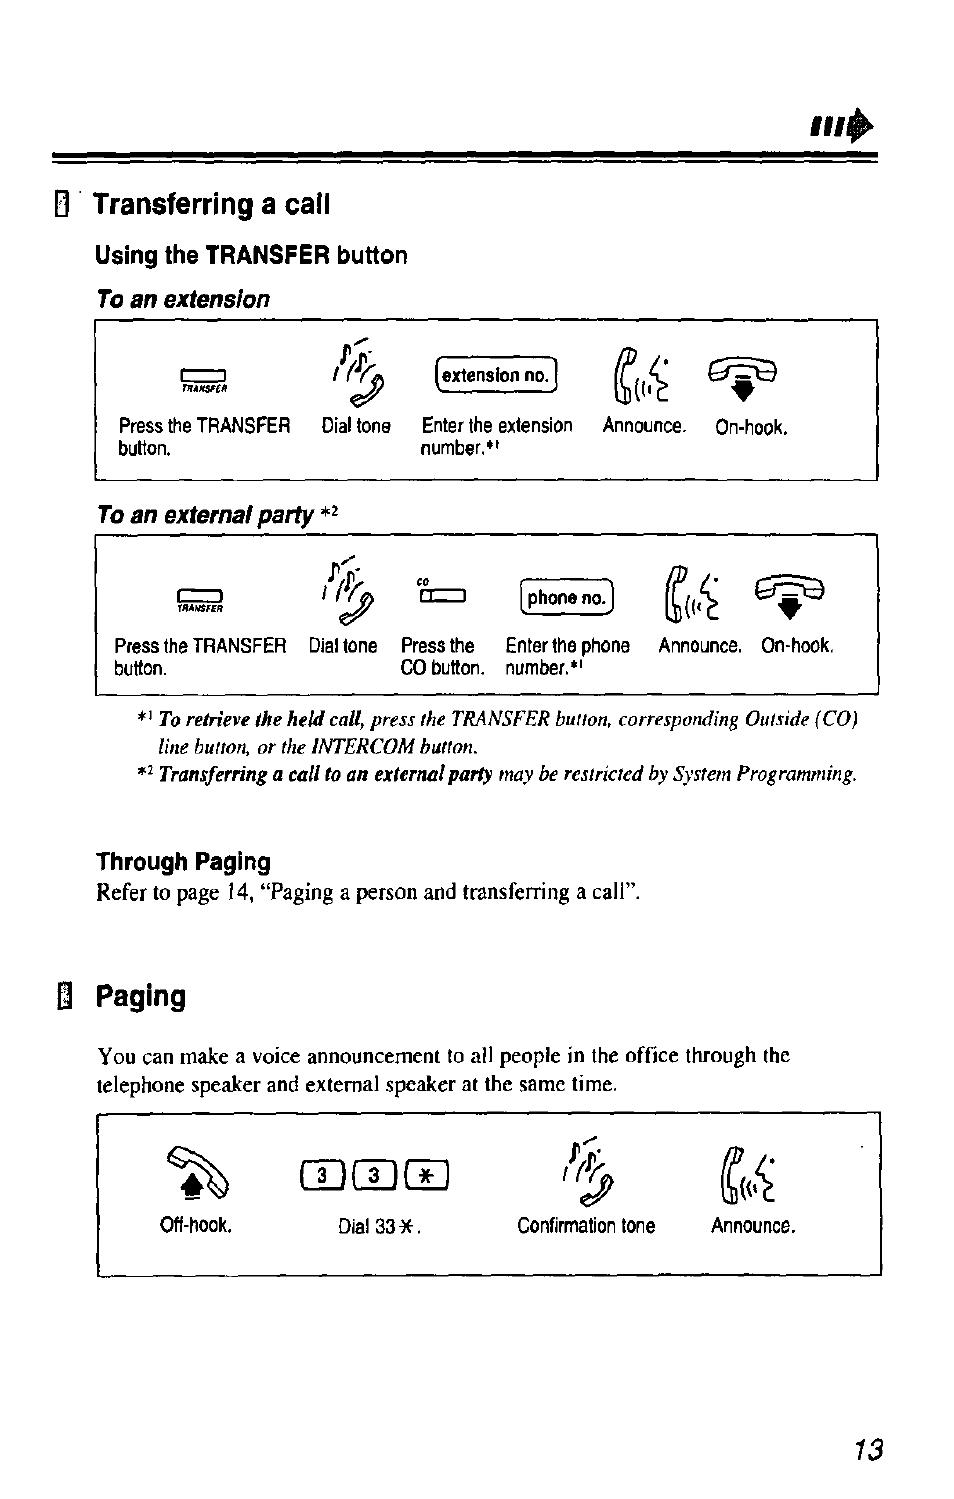 Download free pdf for panasonic kx-t7433 telephone manual.